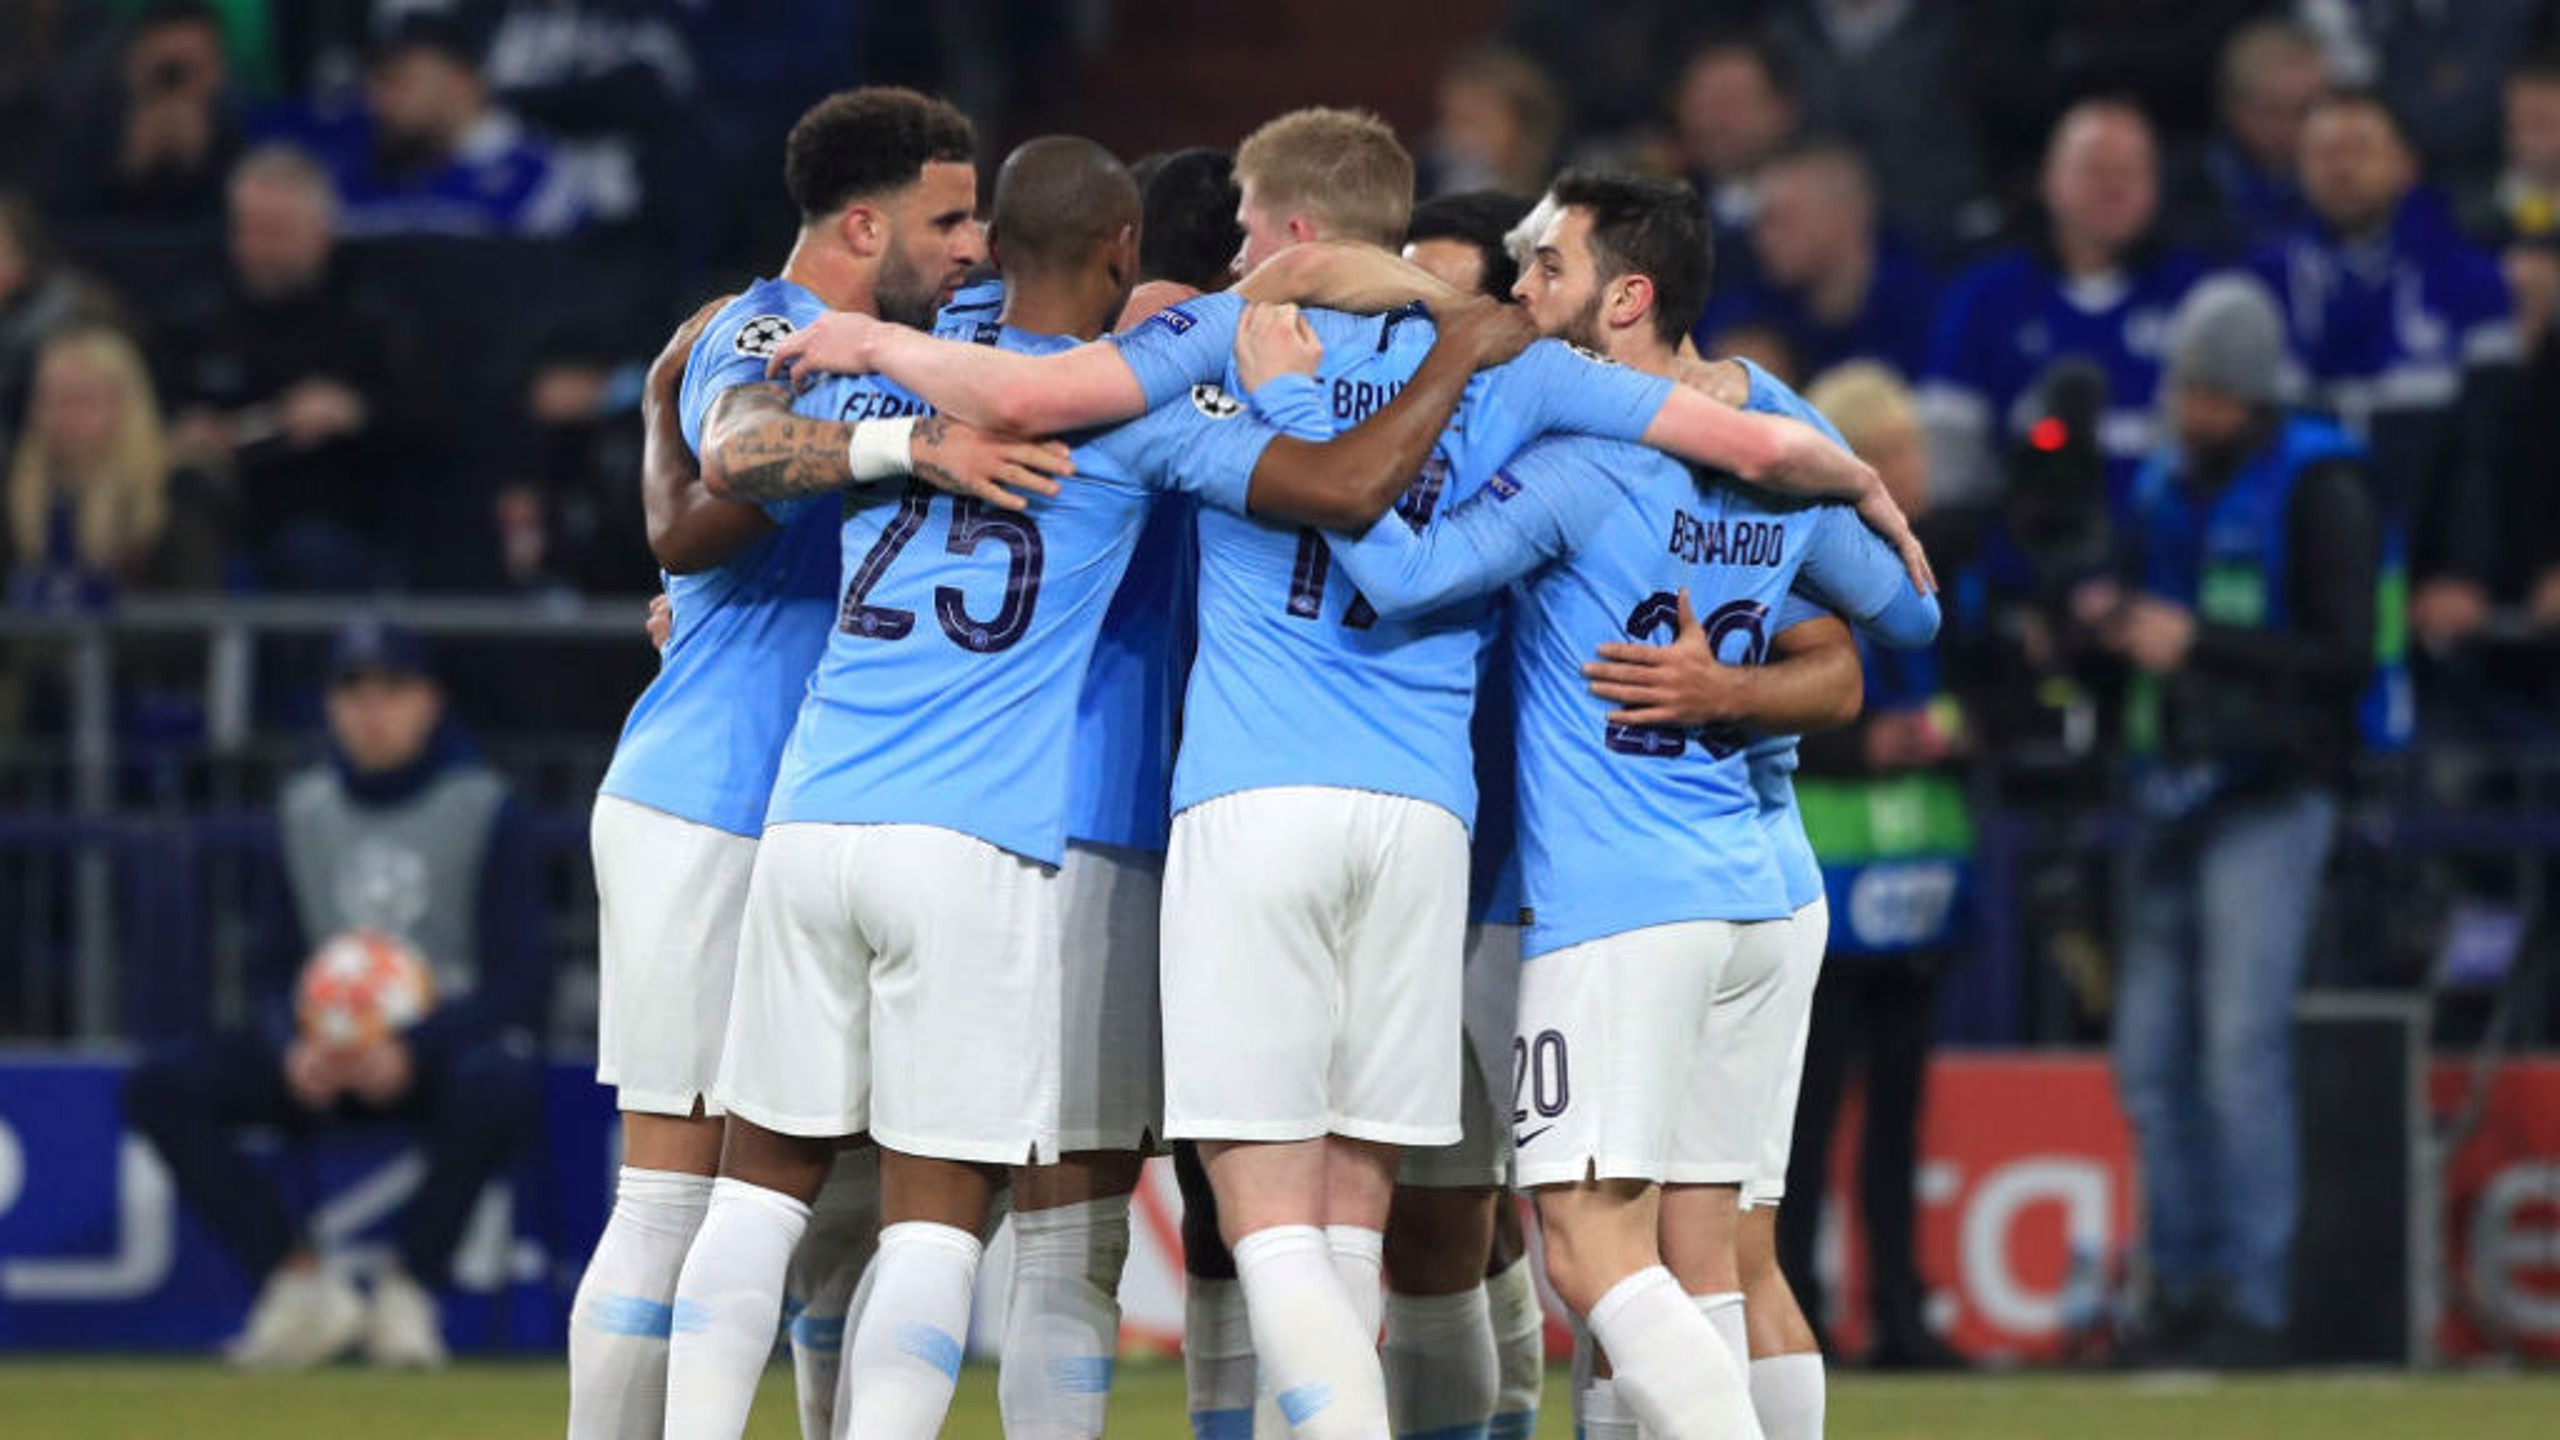 City players celebrate taking the lead through Sergio Aguero!